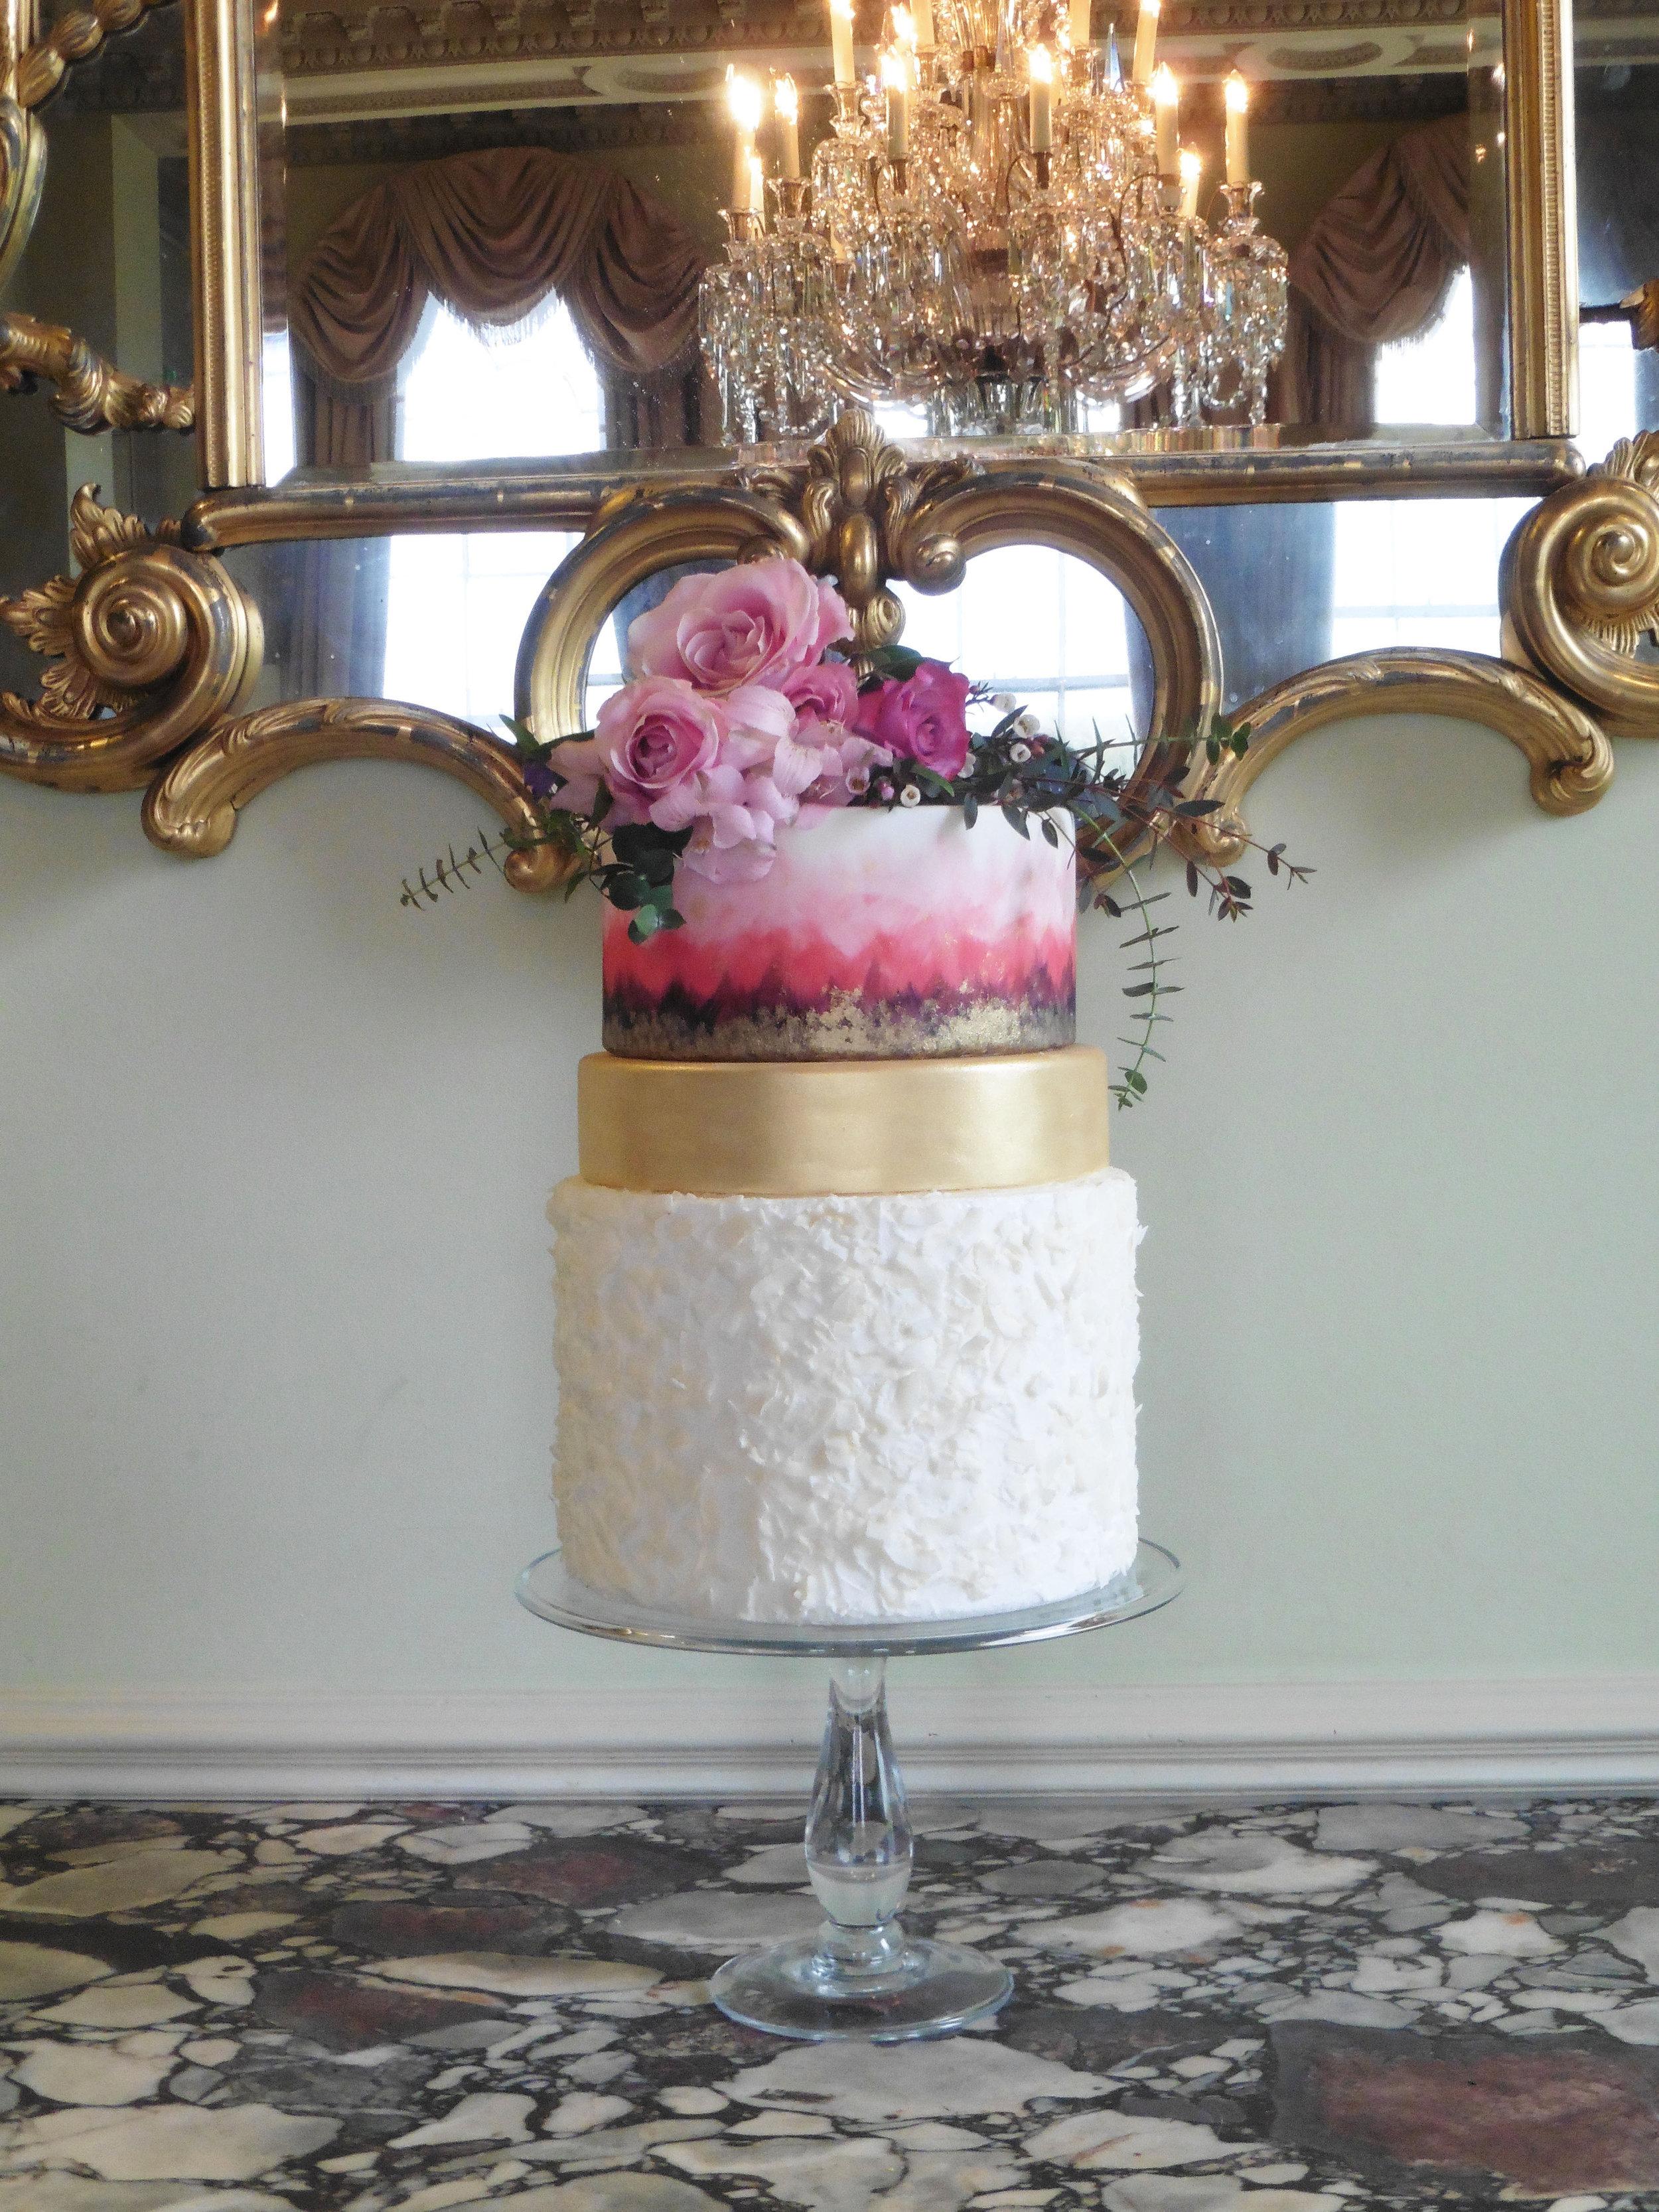 Hand-painted wedding cake